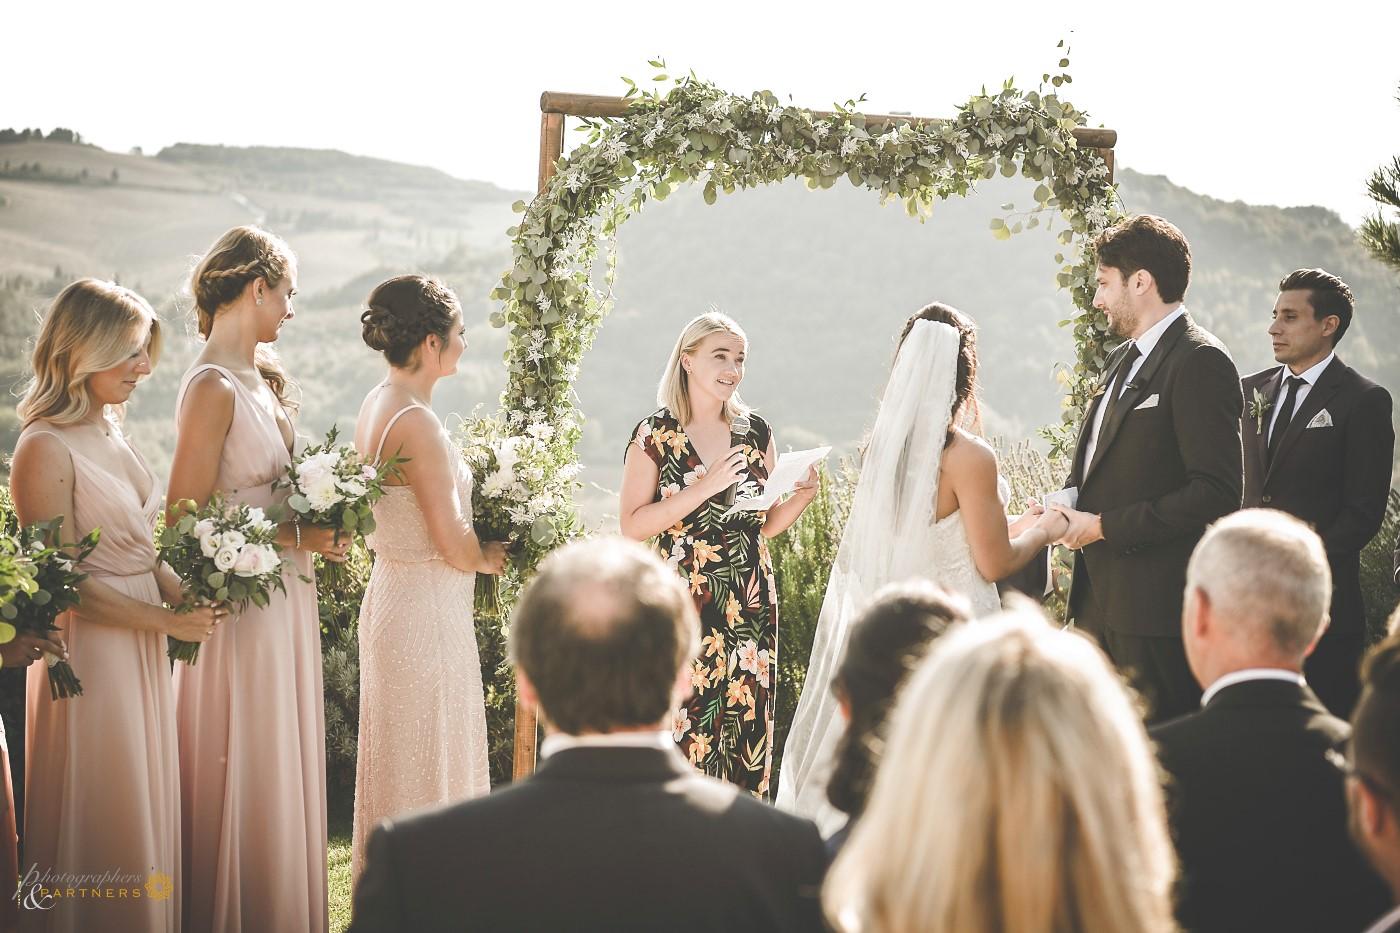 wedding_photographer_montepulciano_11.jpg